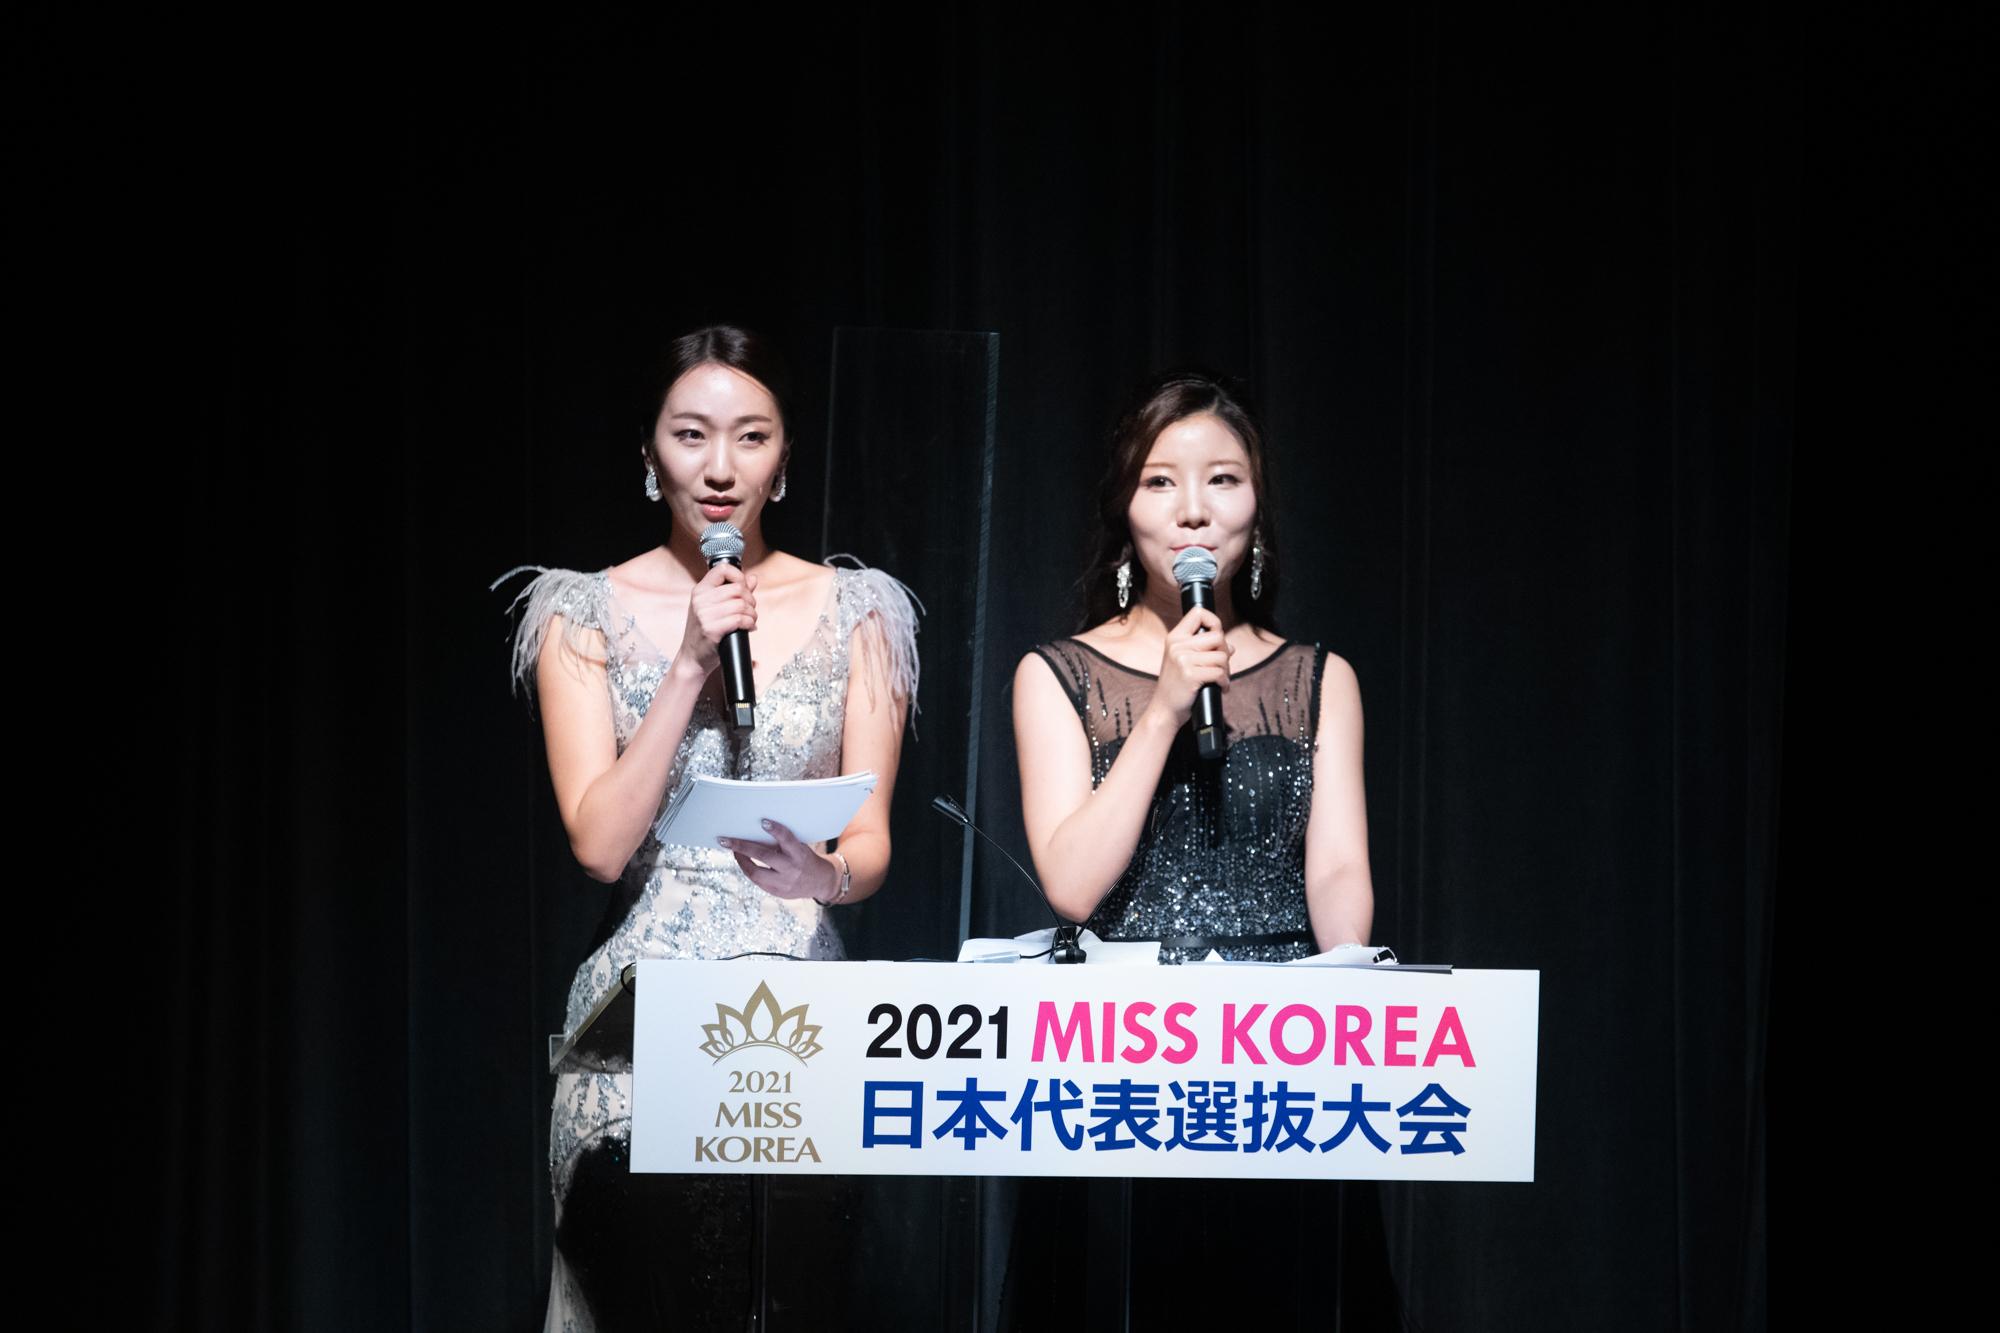 MCを務めた2017年 ミスコリア日本代表「真」キム・ジンアン(左)とベ・ハリン(右)